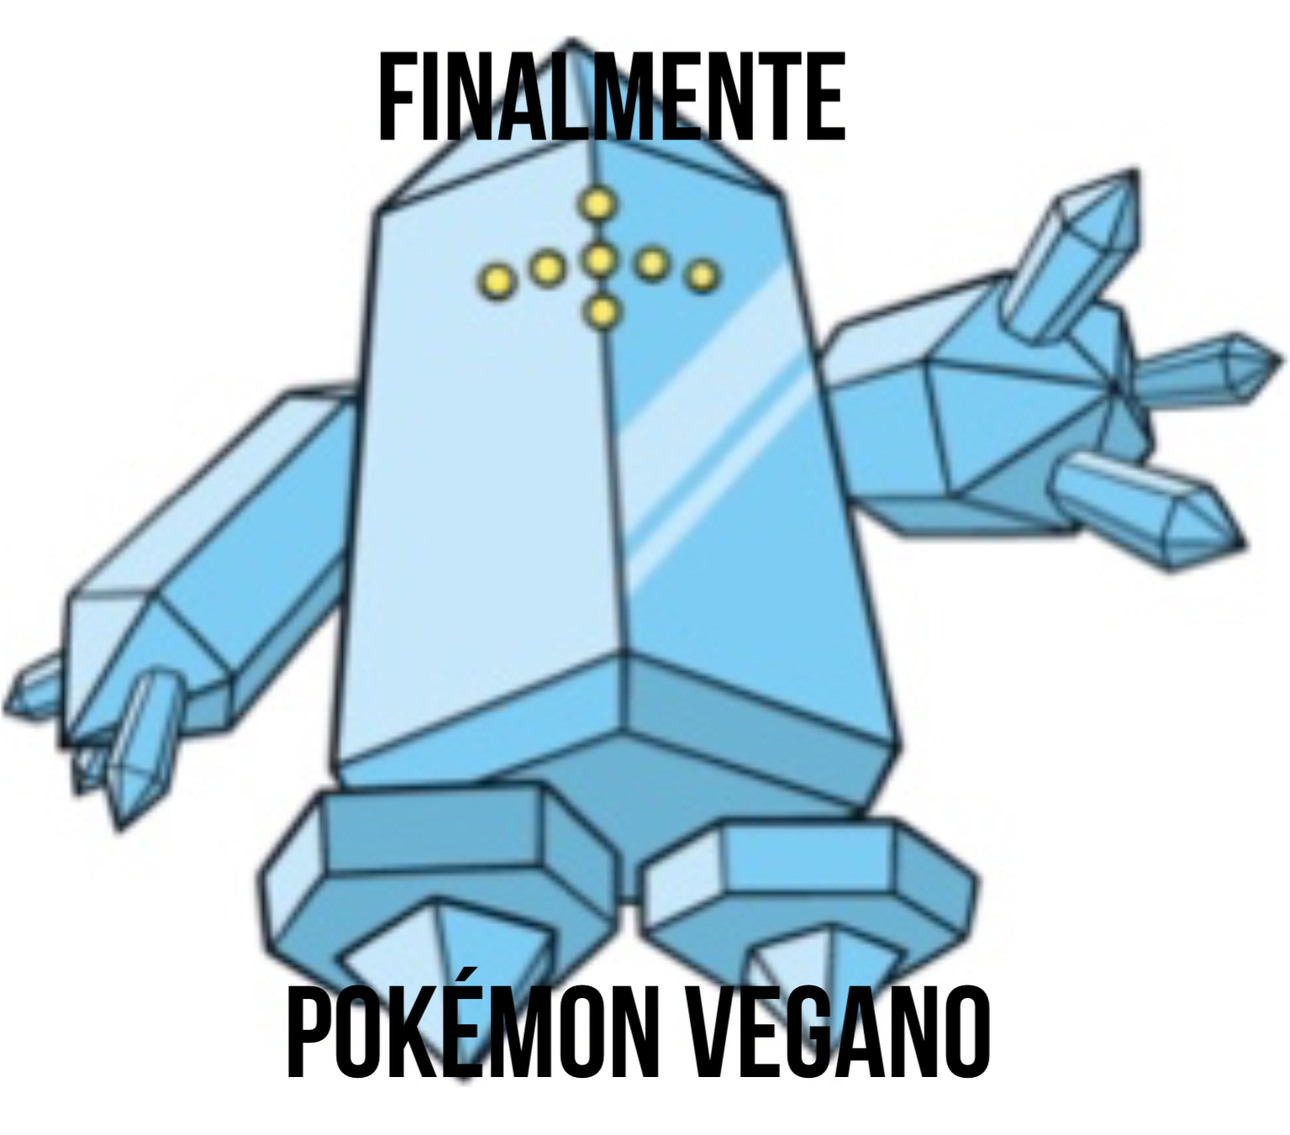 Pokémon vegano - meme